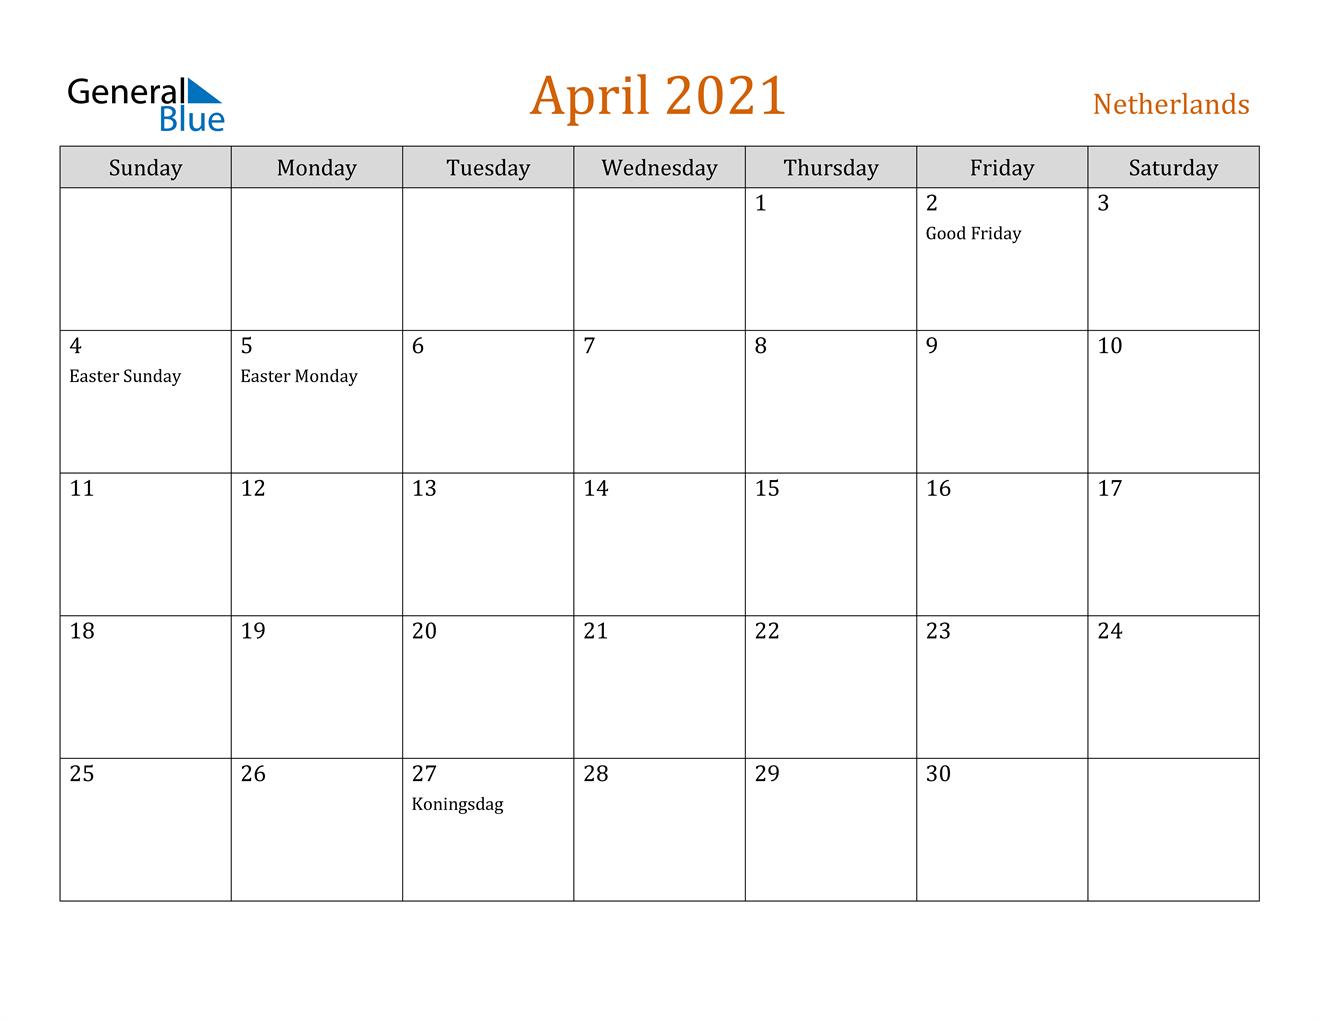 April 2021 Calendar - Netherlands